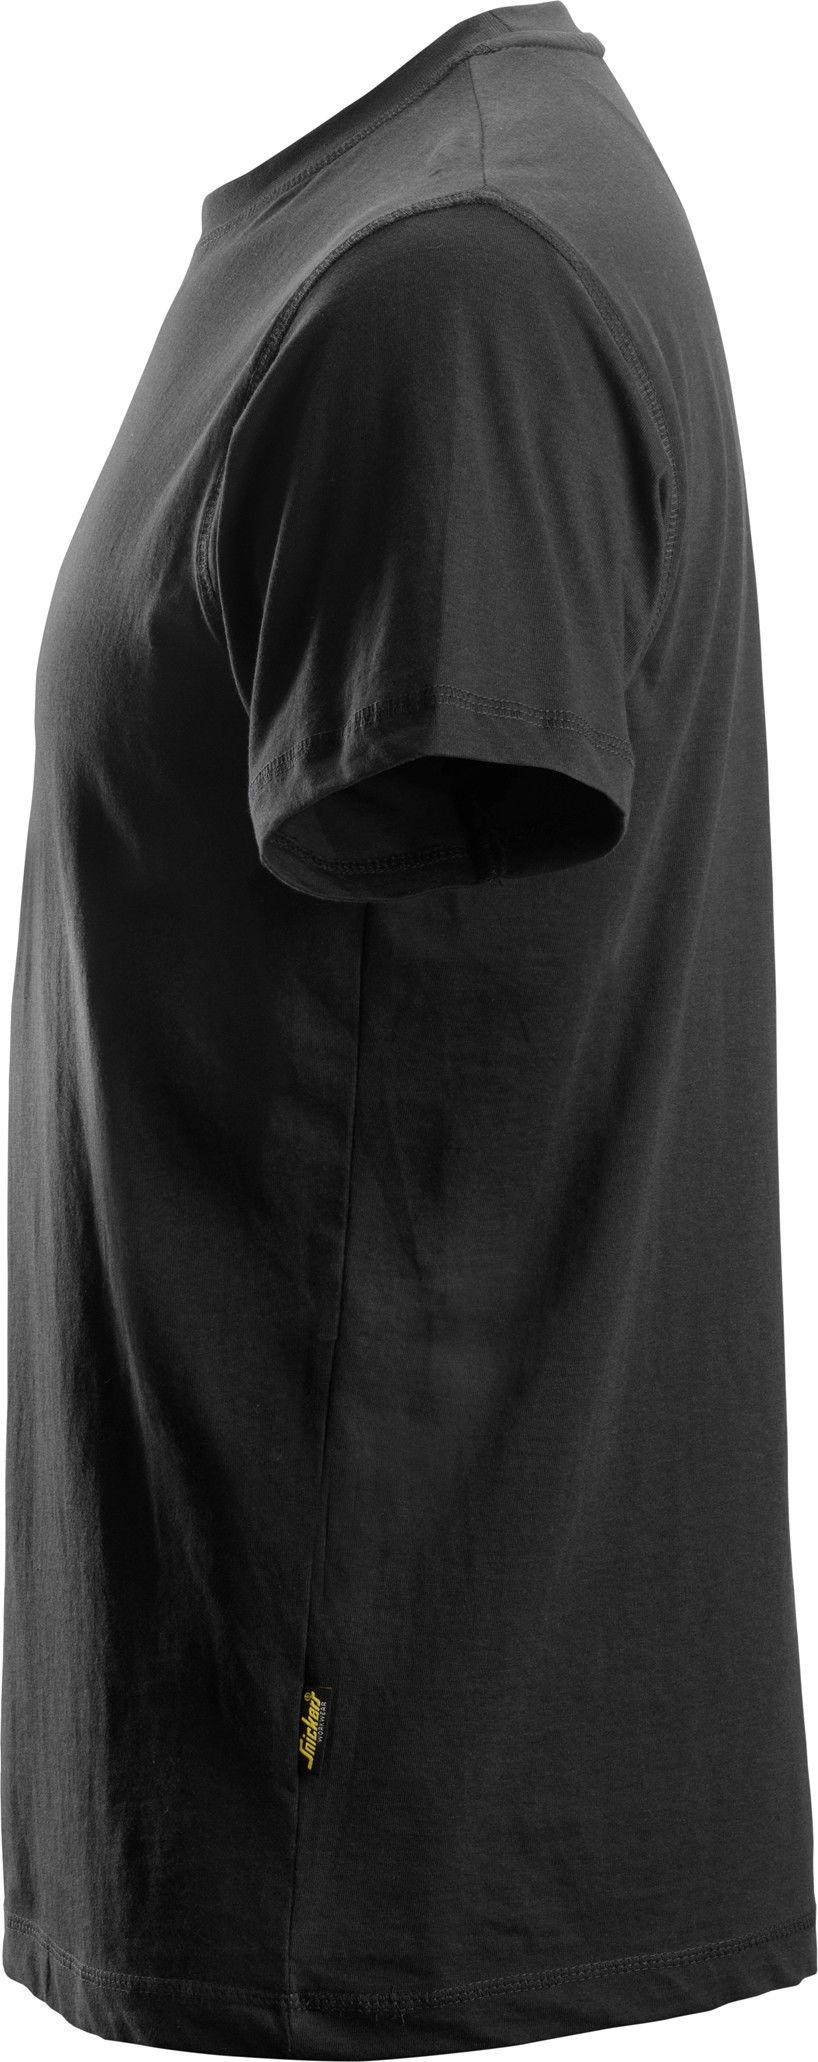 T-shirt koszulka męska, czarna, rozmiar L, 2502 Snickers [25020400006]